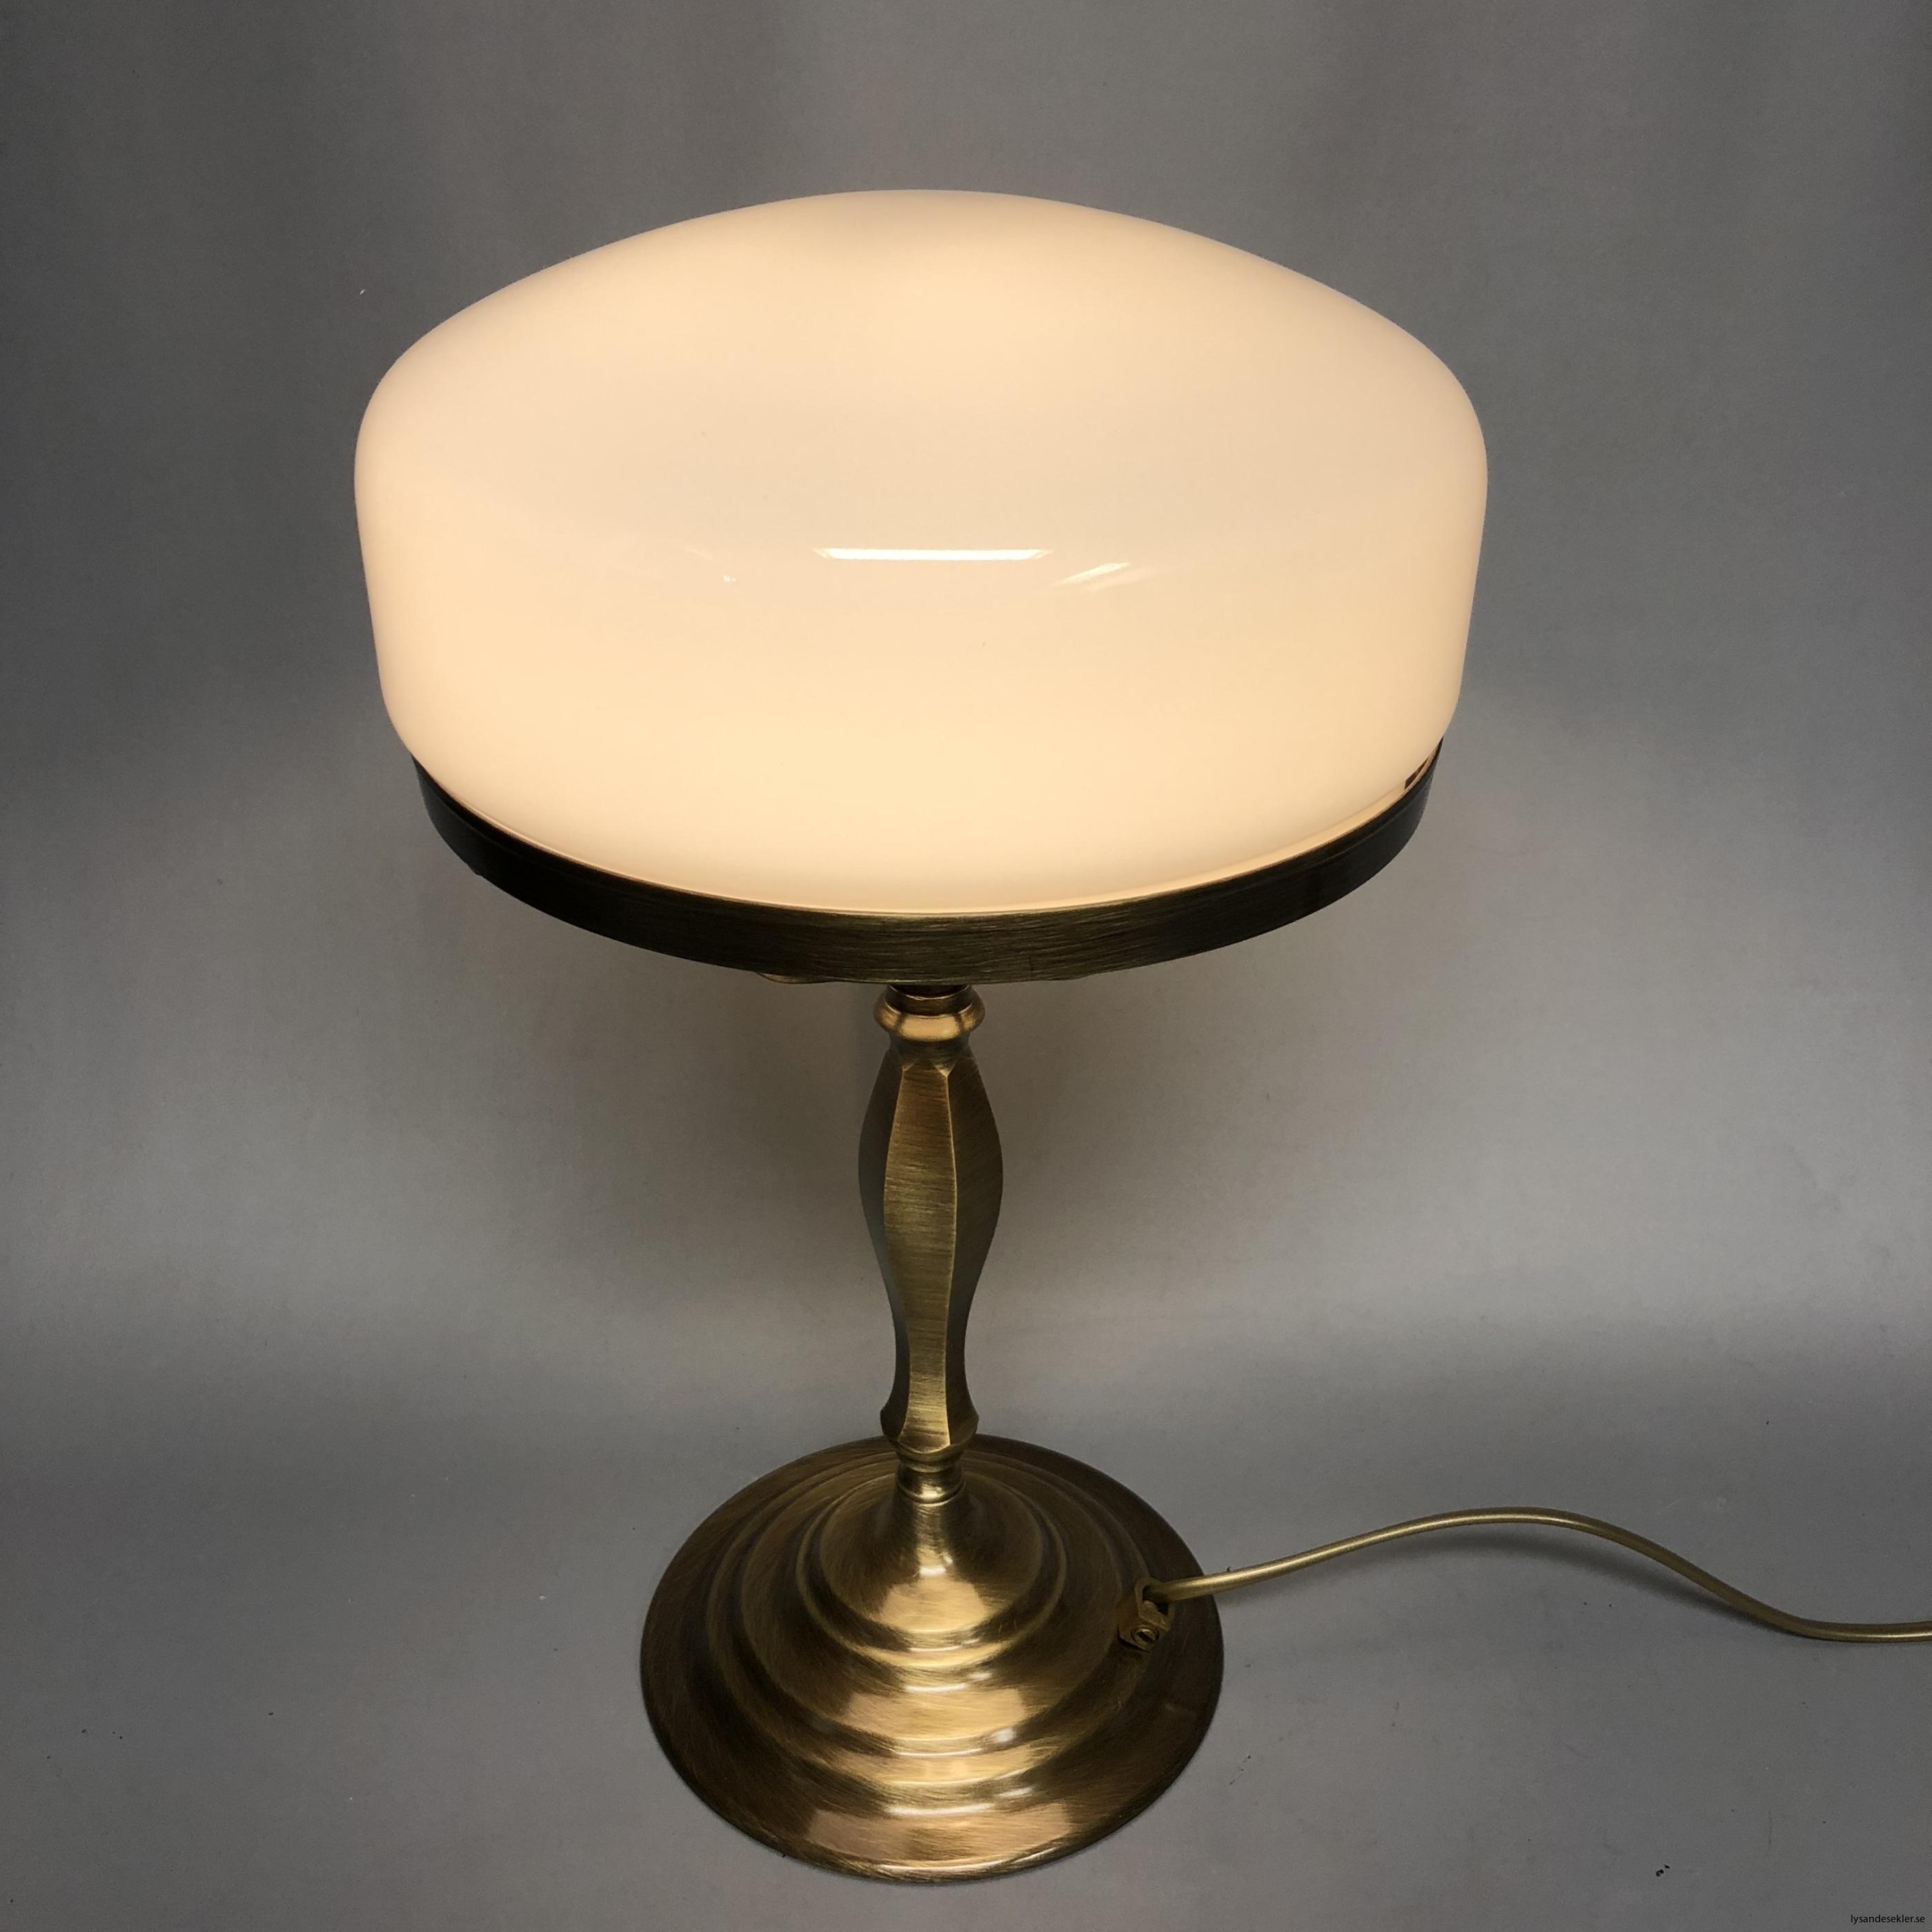 strindbergslampa strindbergslampor strindberg lampa skärm kupa strindbergsskärm strindbergskupa13